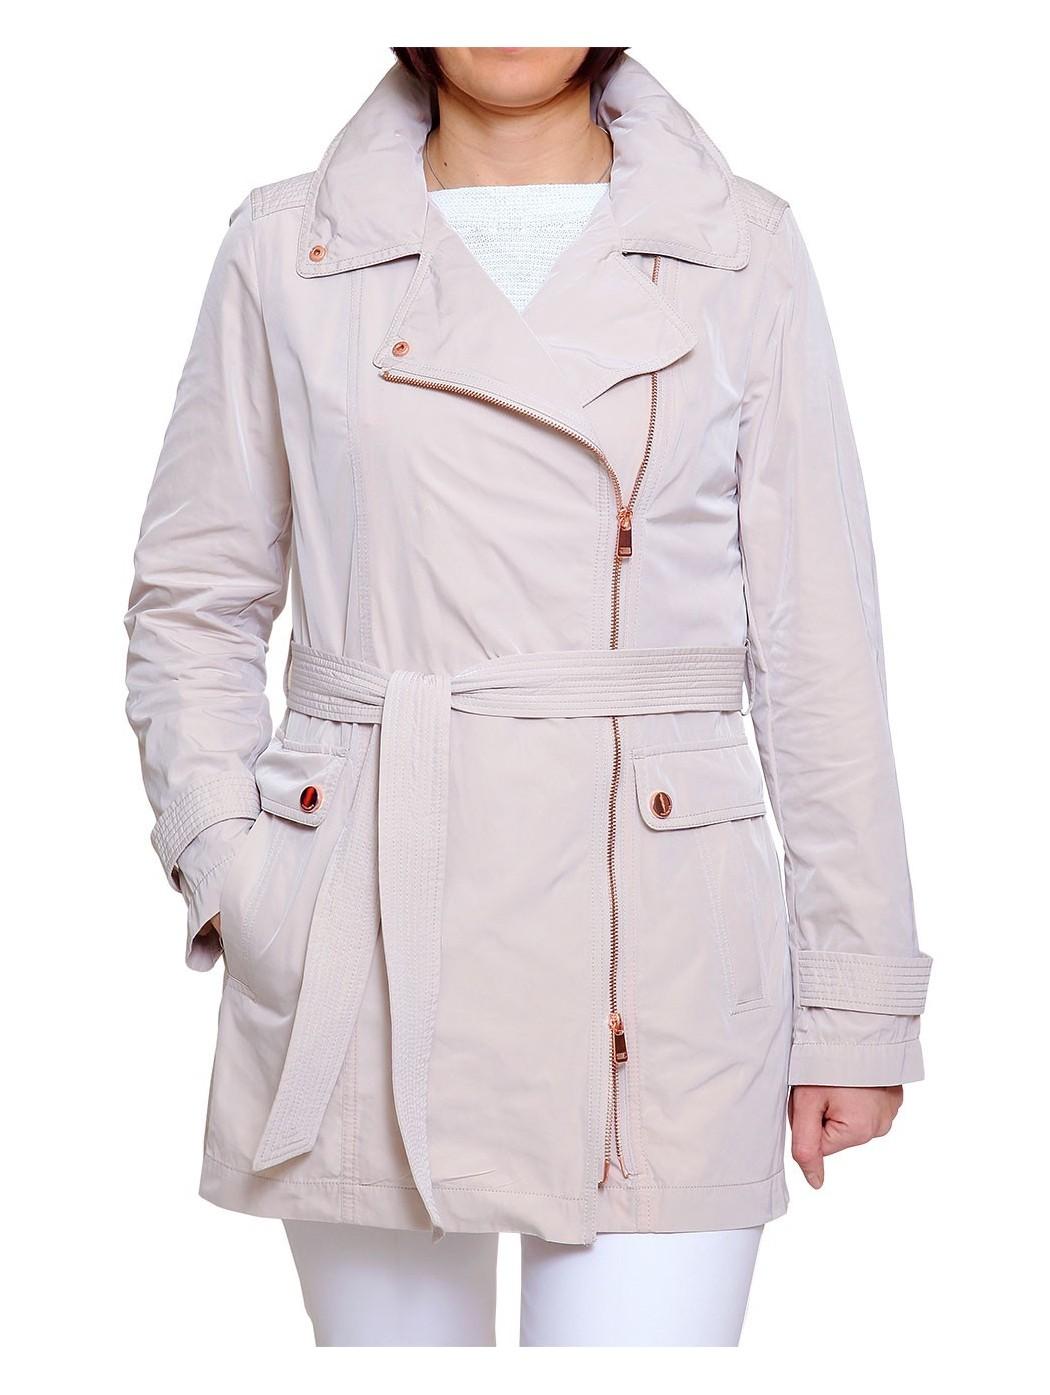 Concept K trench coat